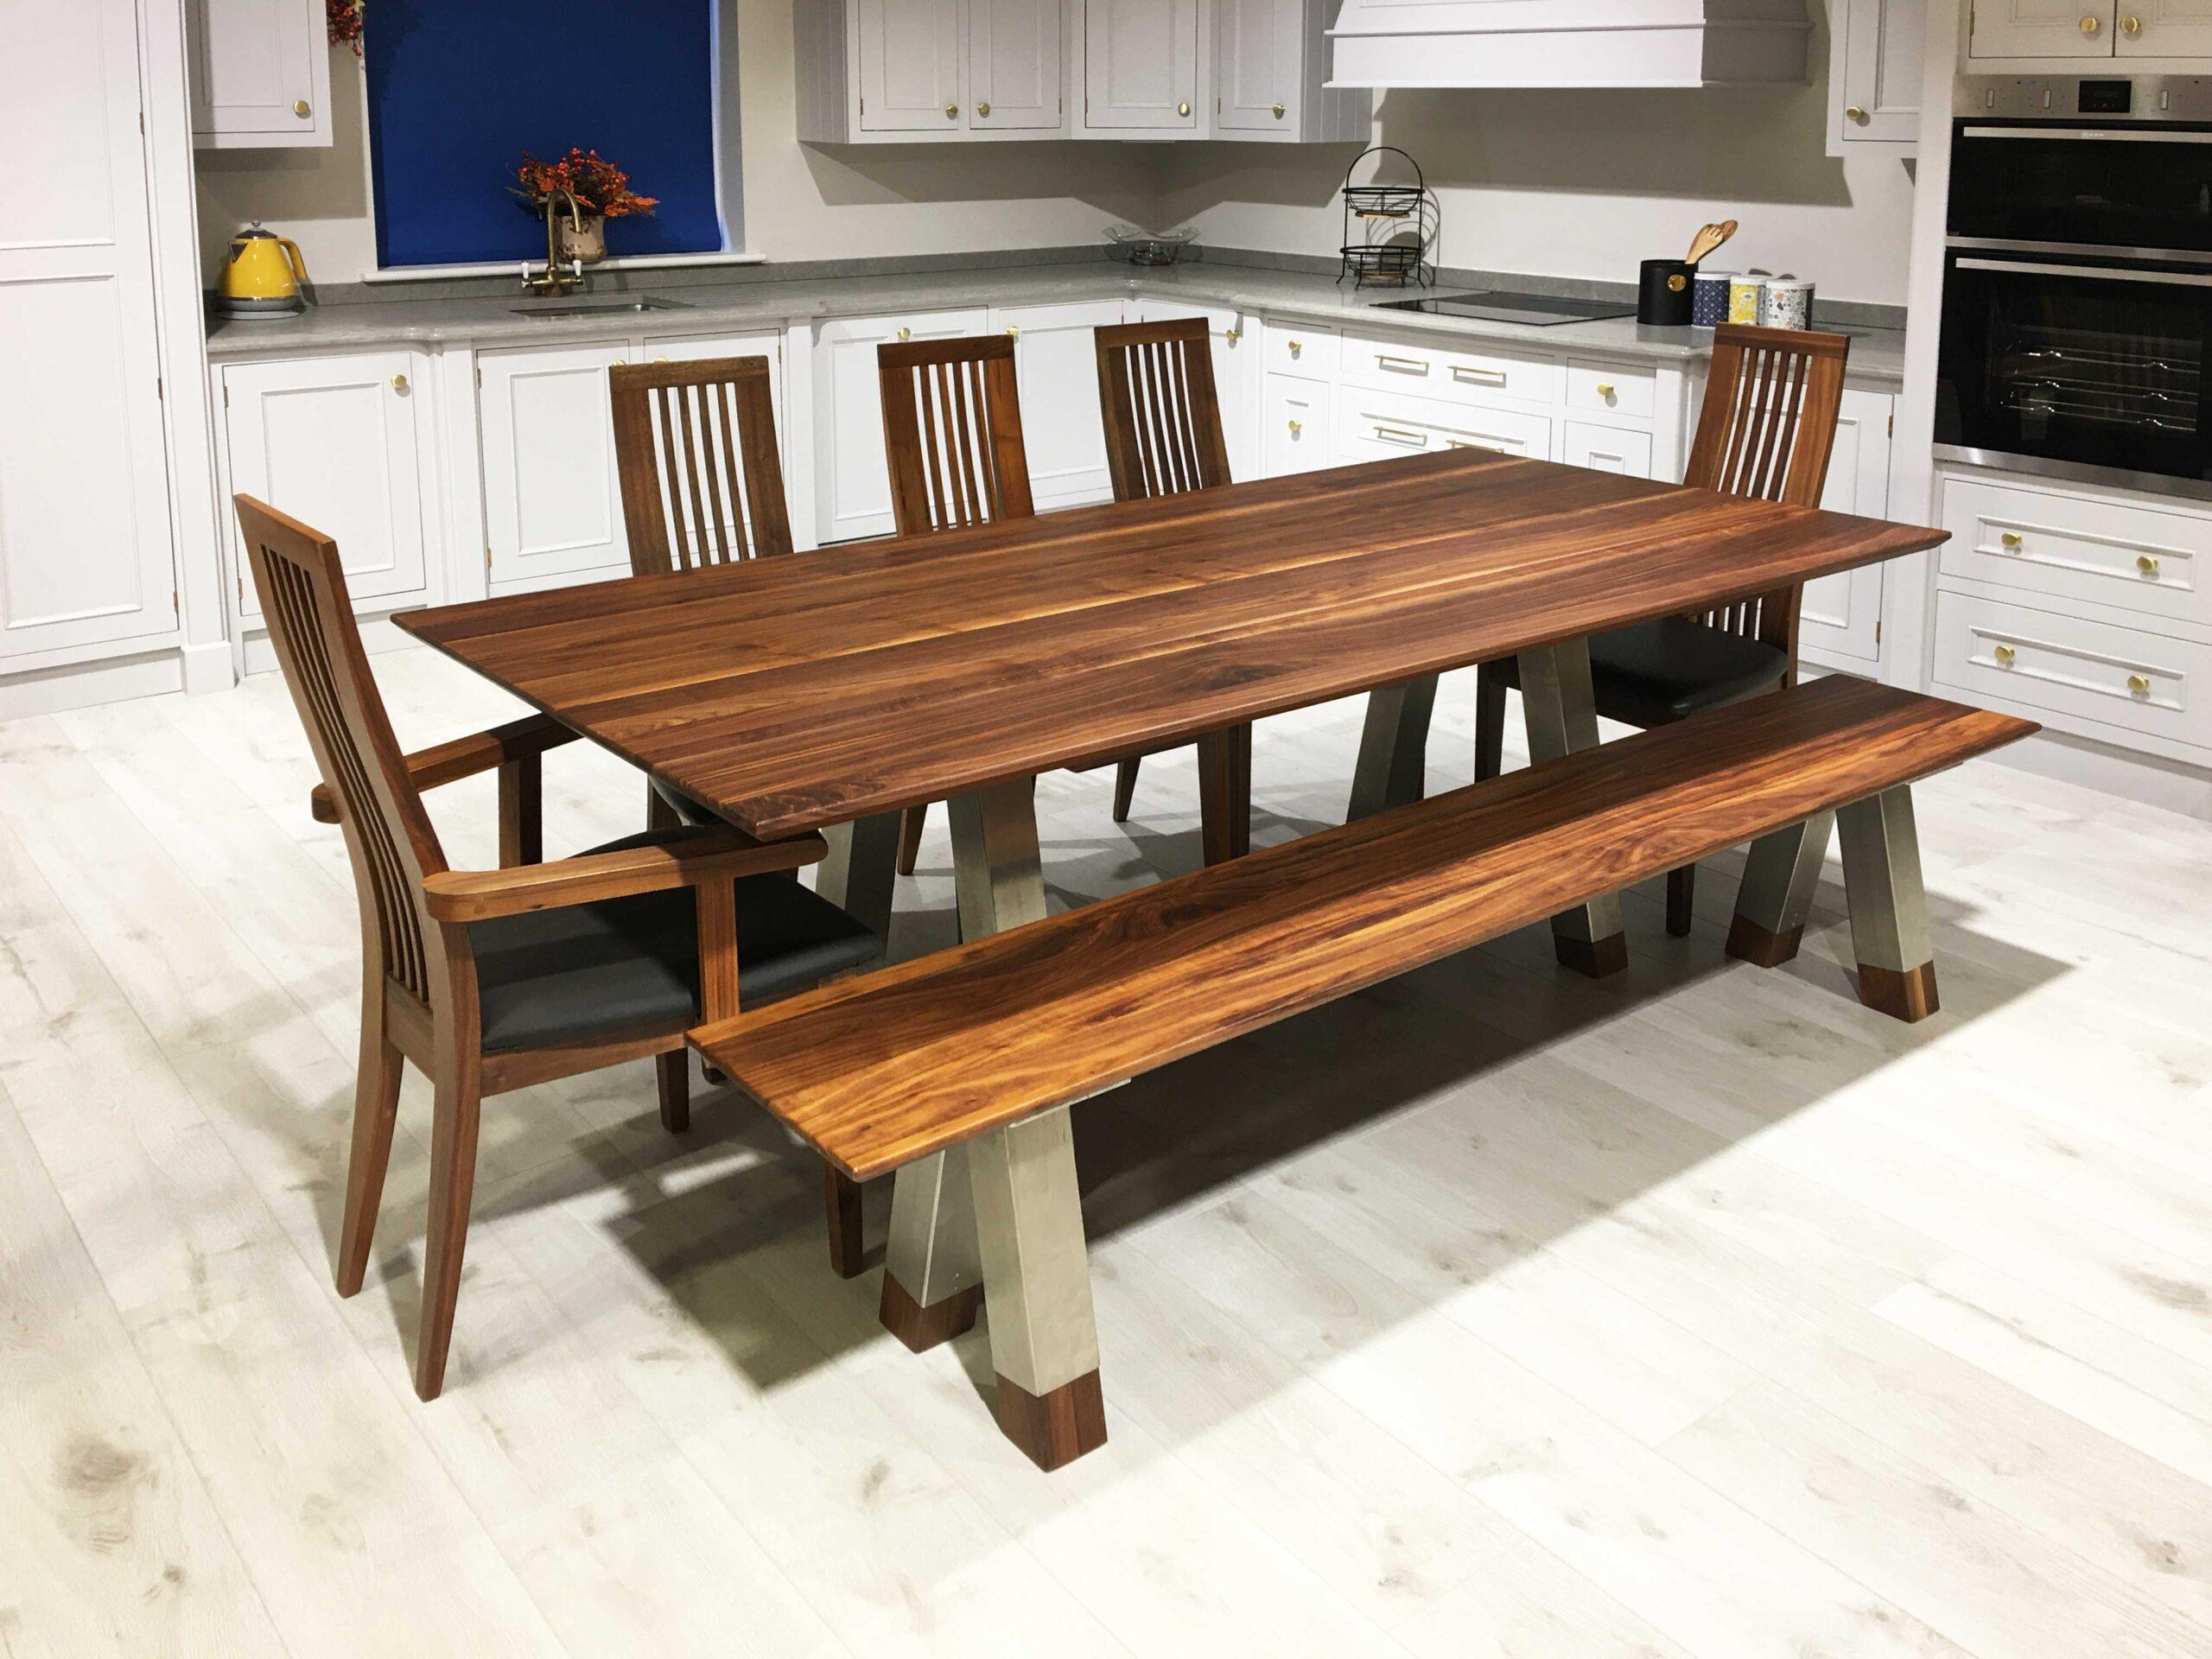 Walnut Rectangular Table Stainless Steel Legs